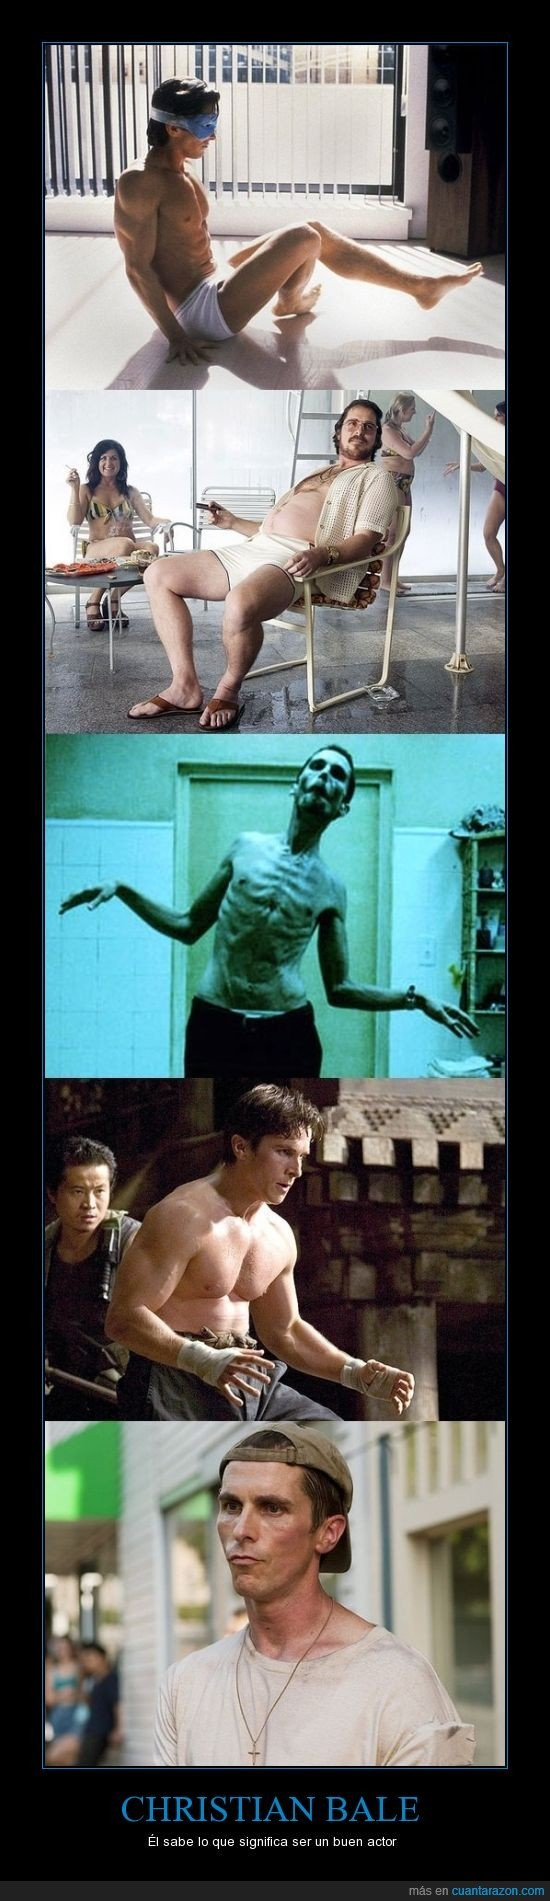 Christian Bale es una verga - meme